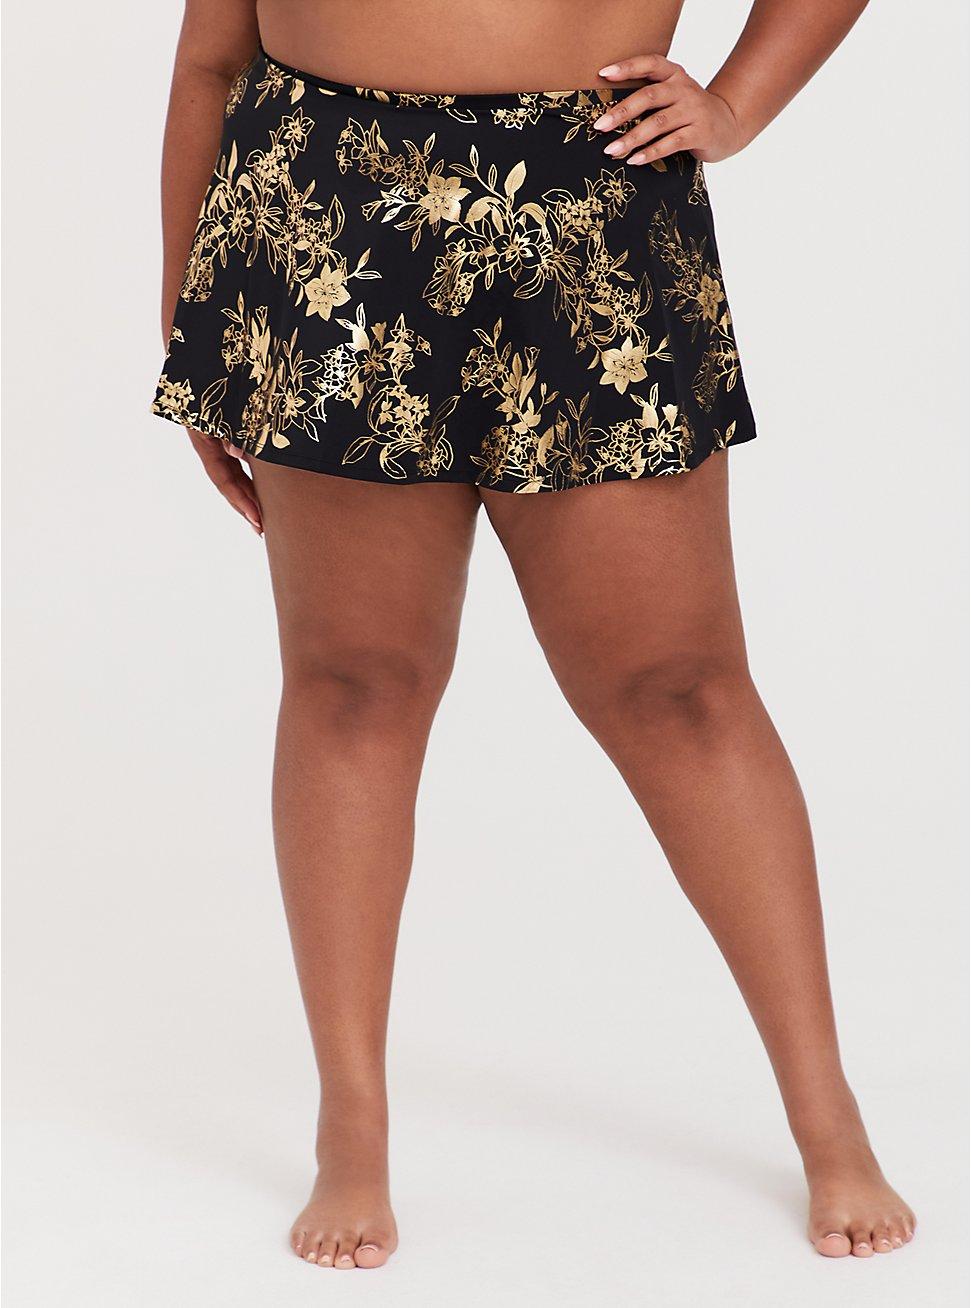 Plus Size Black & Gold Floral High Waist Skater Swim Skirt, MULTI, hi-res